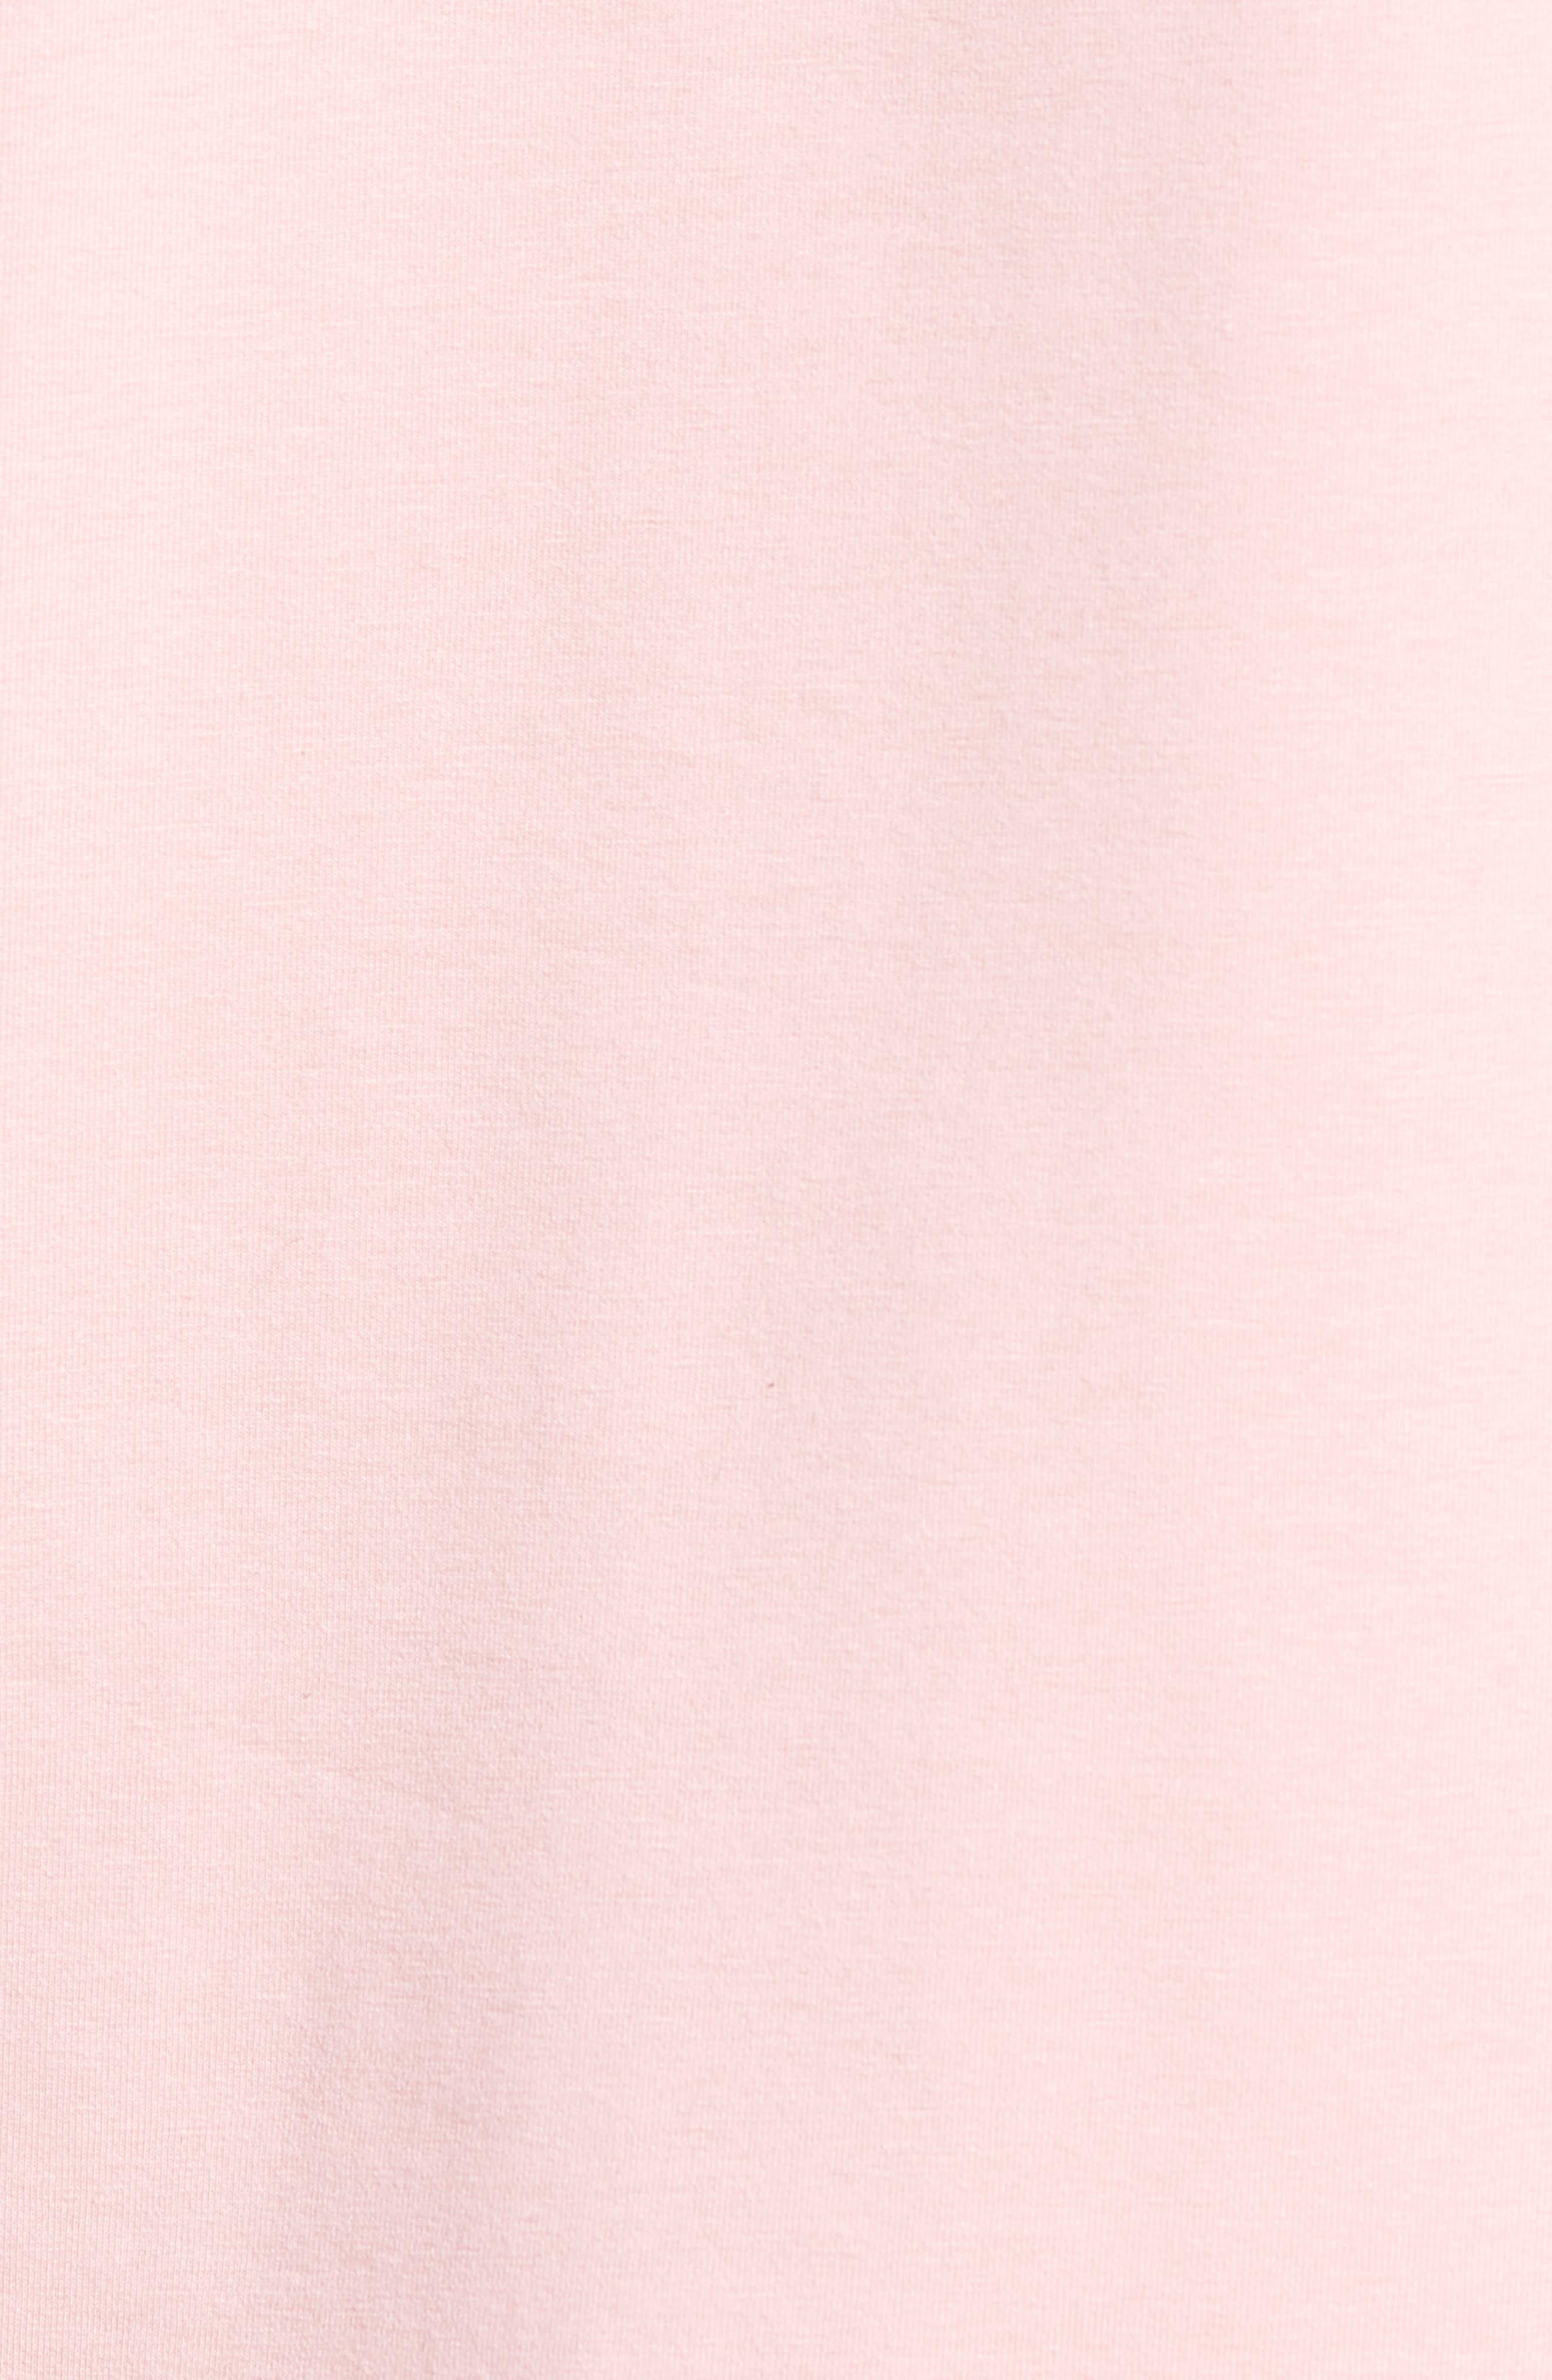 Trim Fit Long Sleeve T-Shirt,                             Alternate thumbnail 15, color,